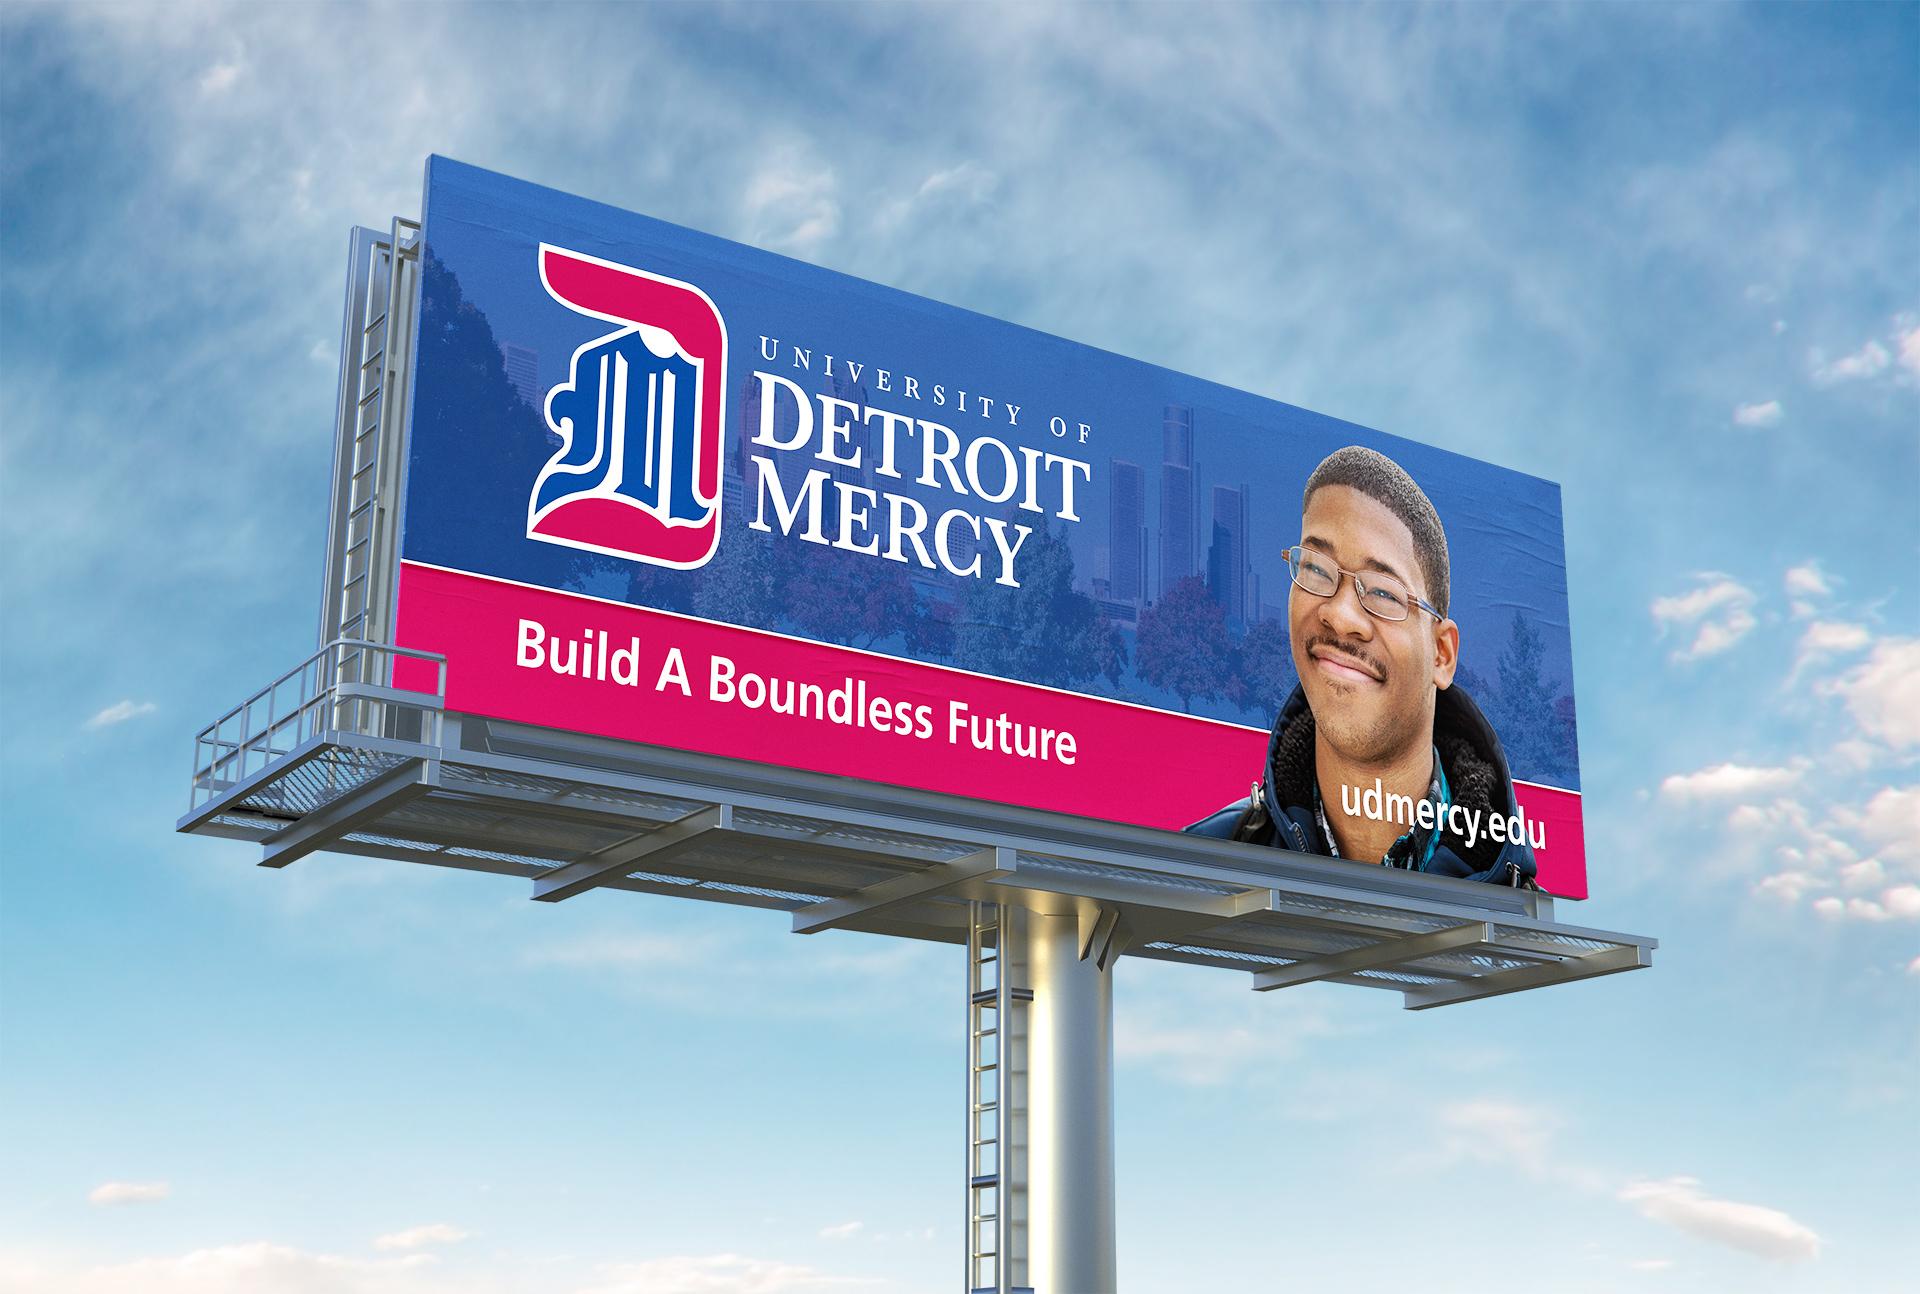 Detroit Mercy Billboard